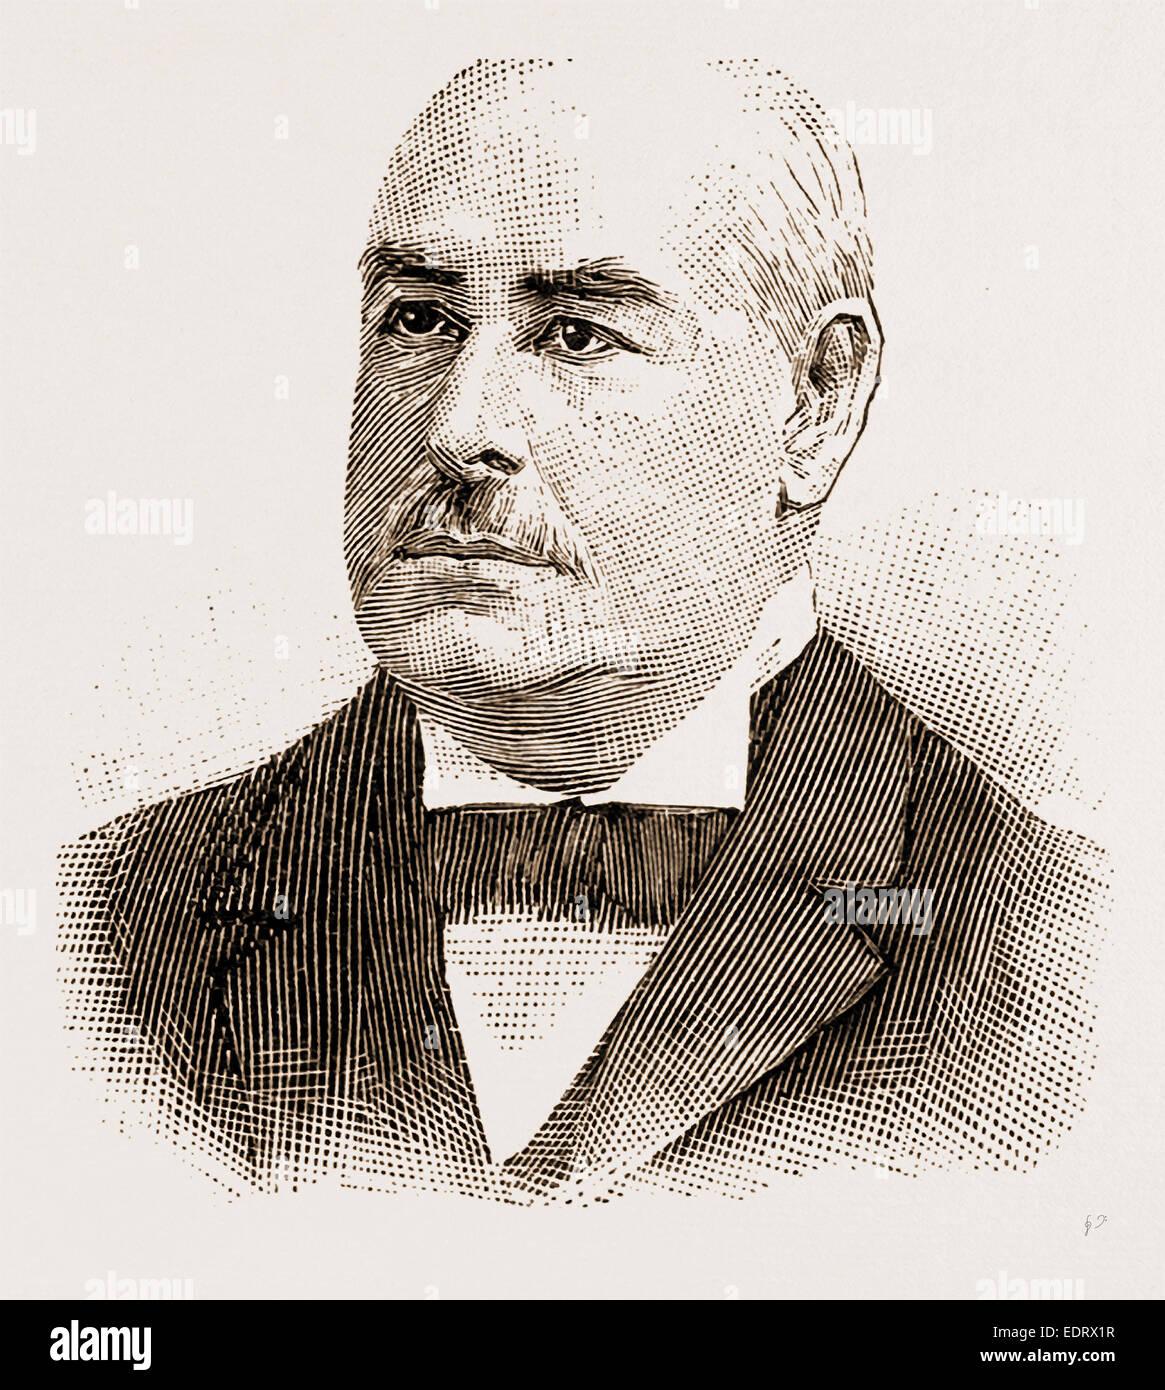 Mk. D. M. DICKENSON MR. JUSTICE PUTNAM MR. CHANDLER:P. ANDERSON MR. JUSTICE KING MR. FREDERICK PETERS, Q.C. - Stock Image